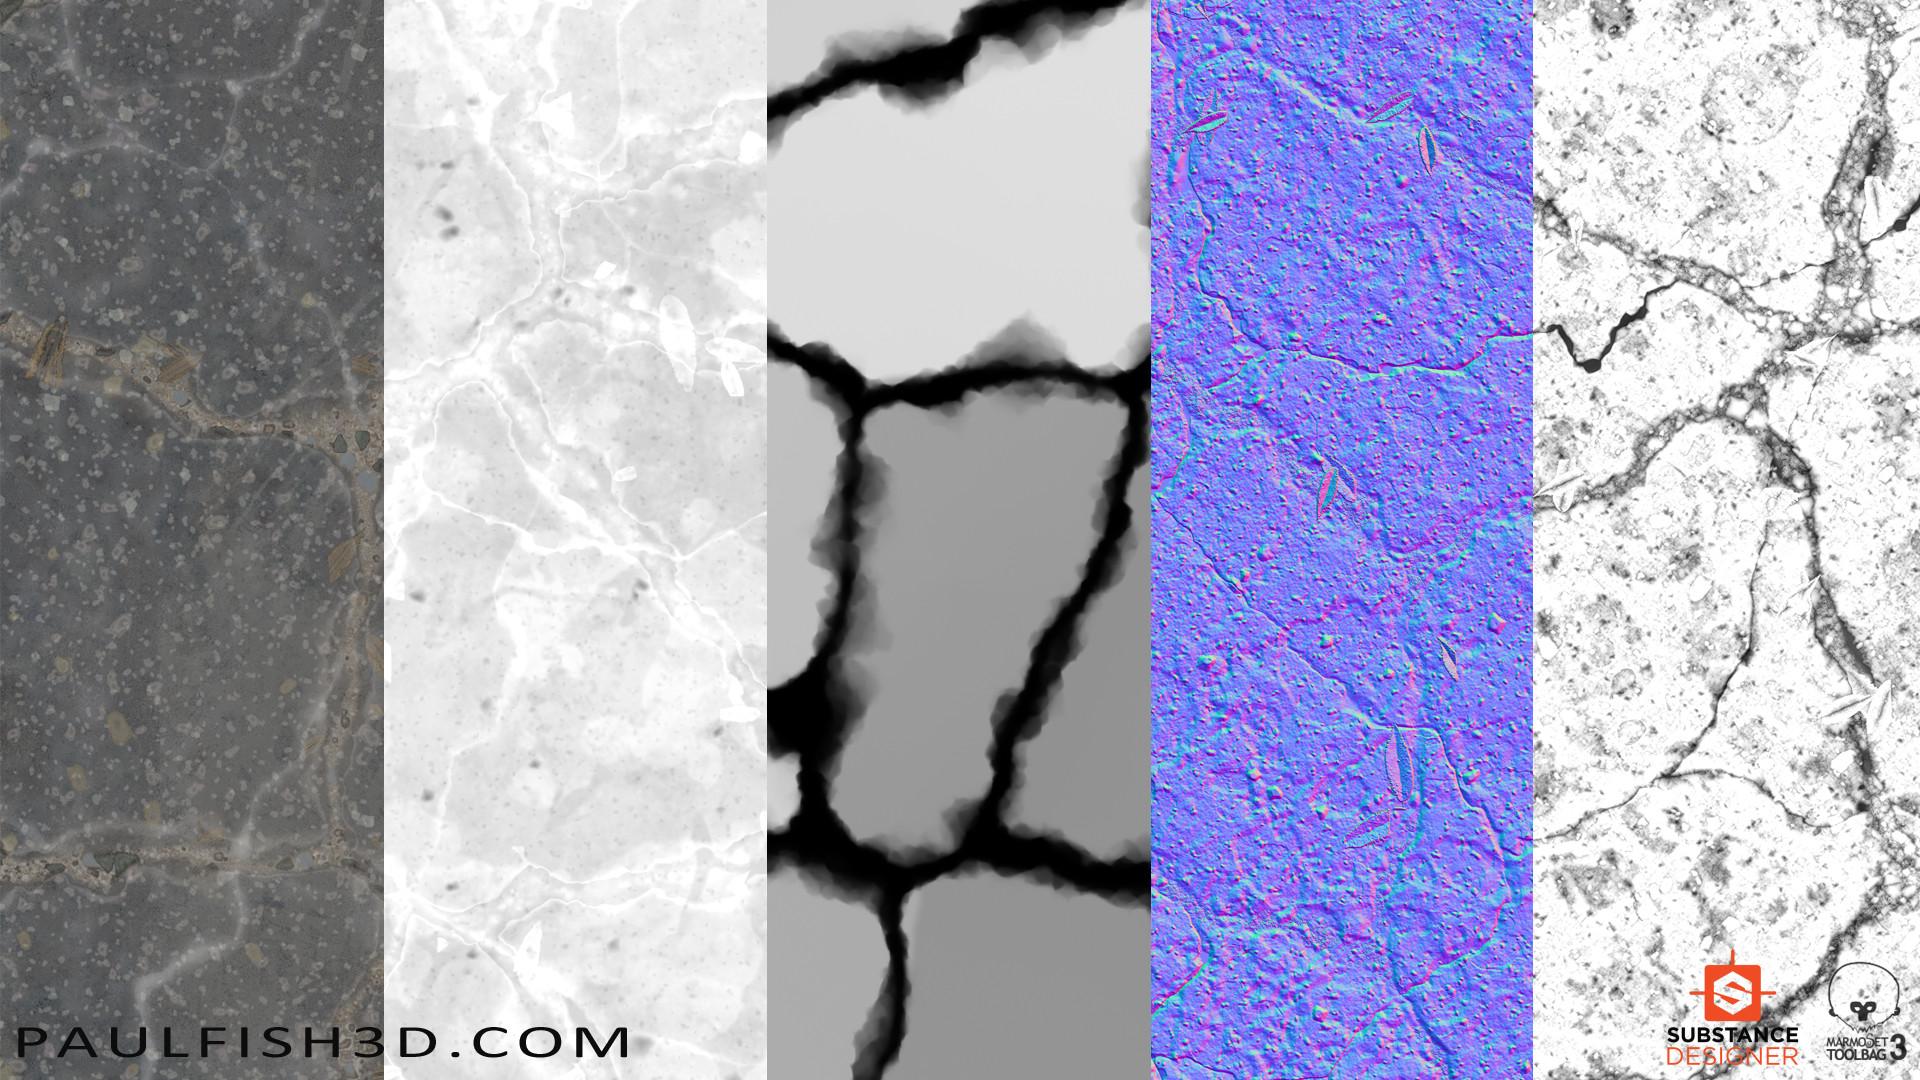 Paul fish ground asphalt old broken textures